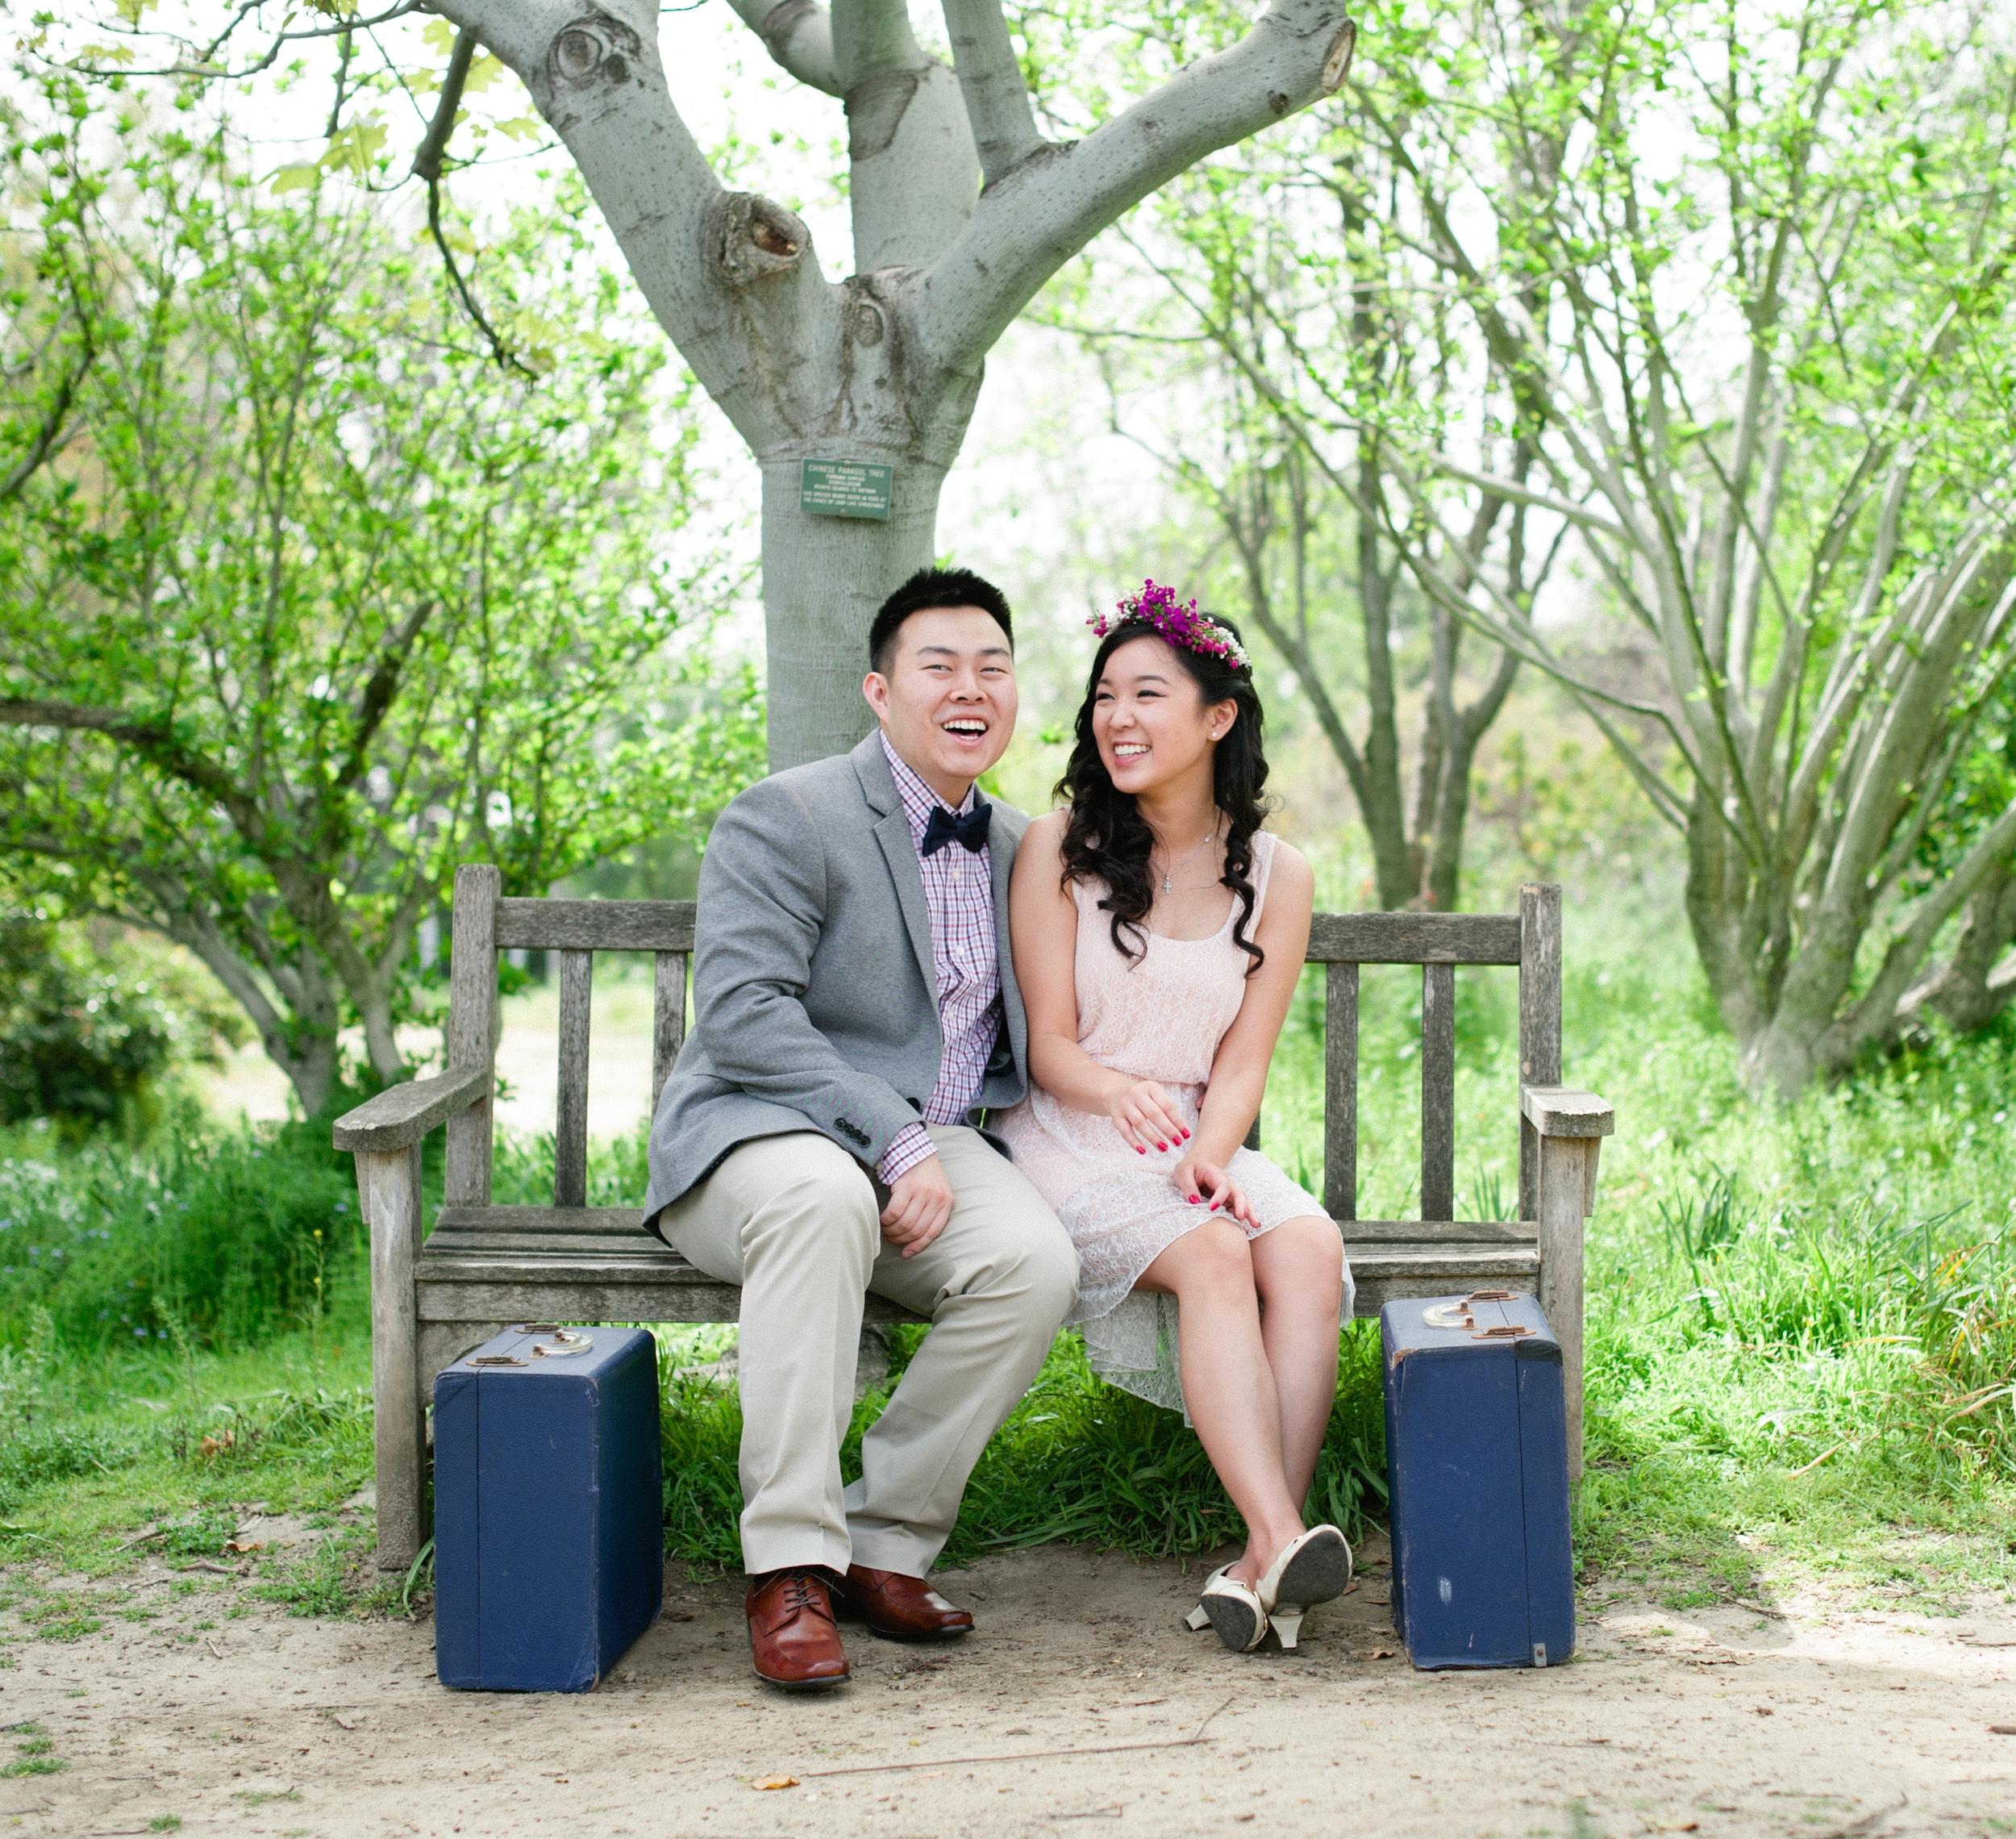 agnes and chun - carissa woo photography-185.jpg